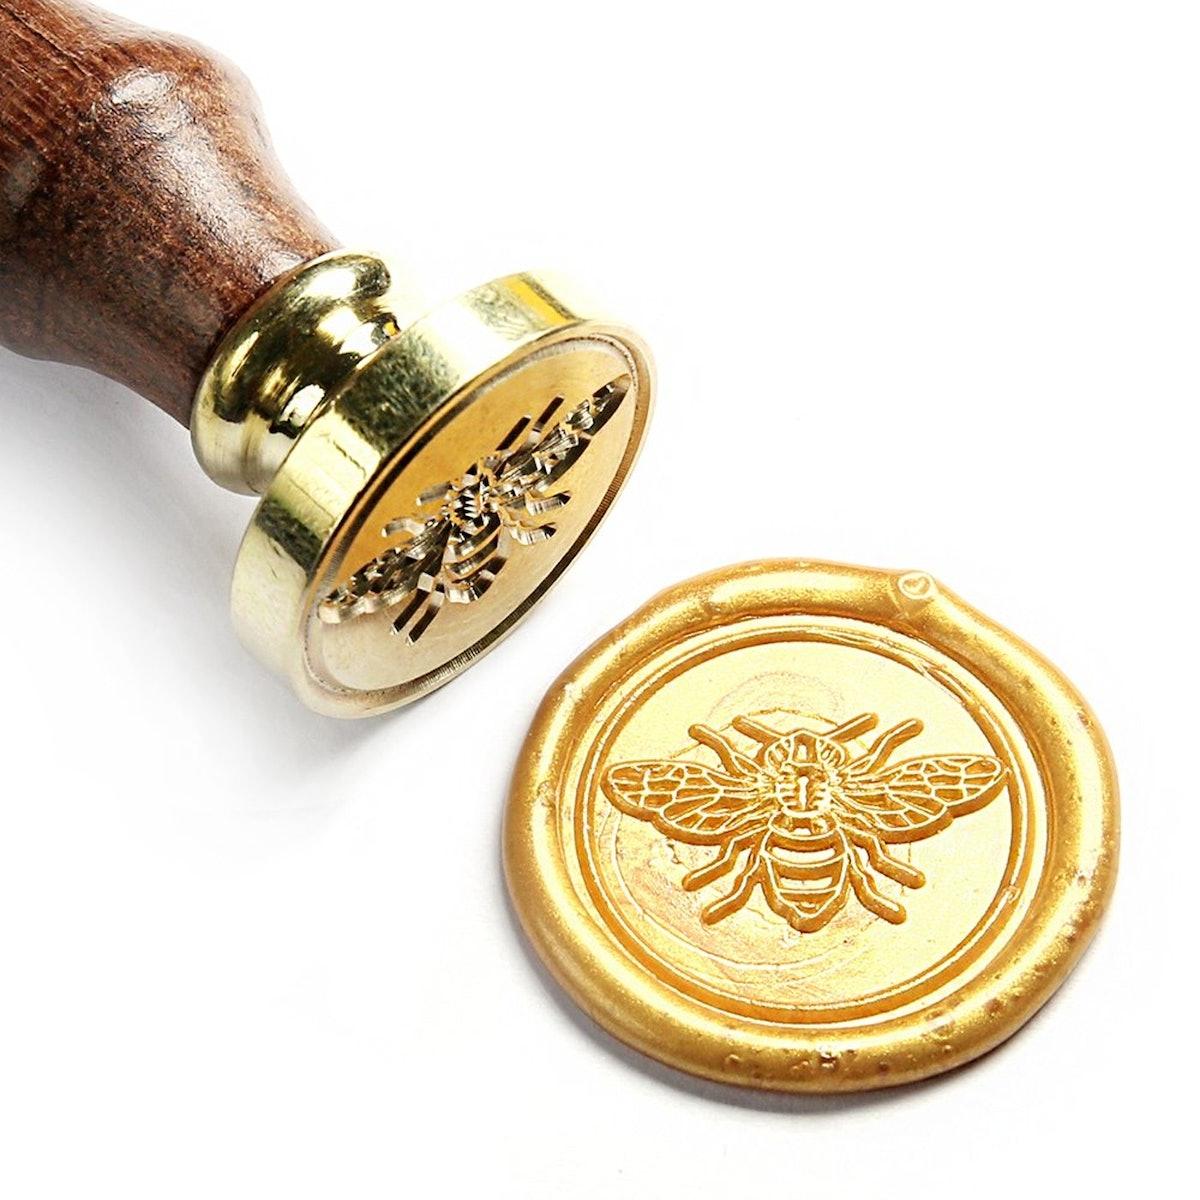 UNIQOOO Cute Little Bee Wax Seal Stamp